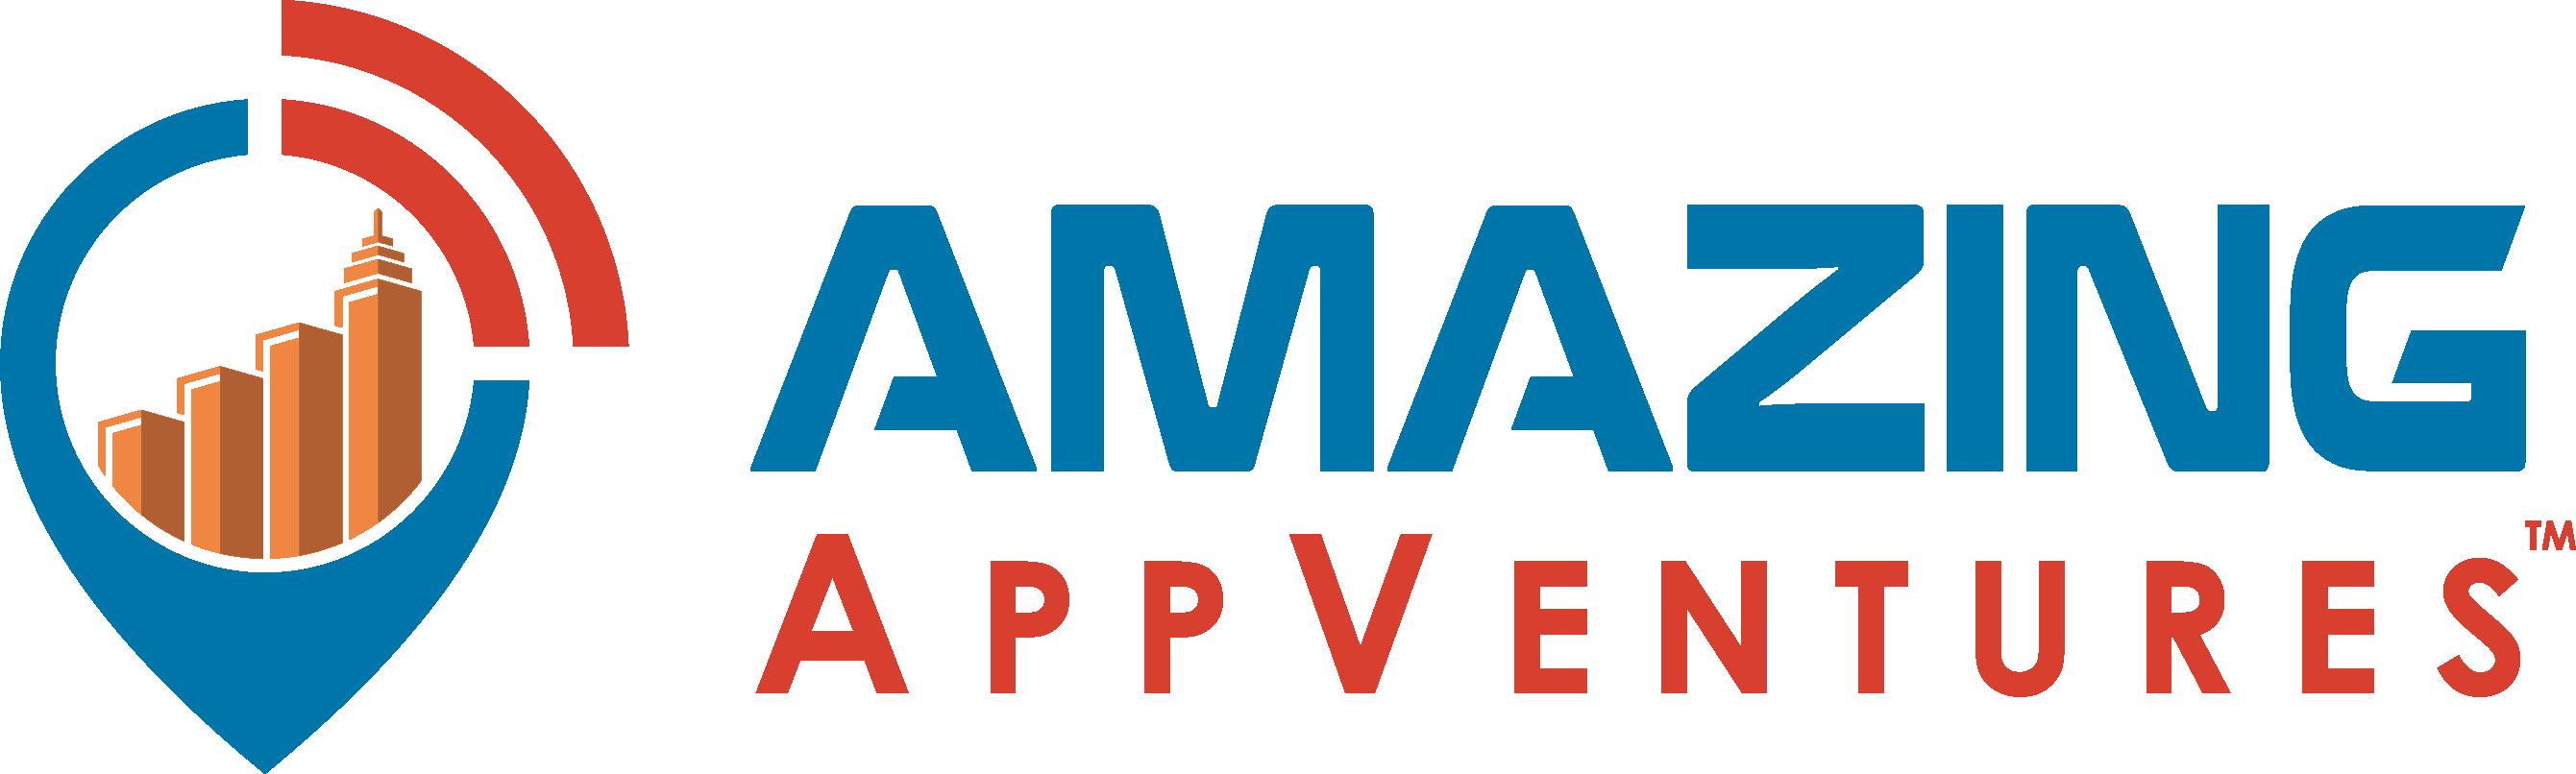 Amazing AppVentures logo